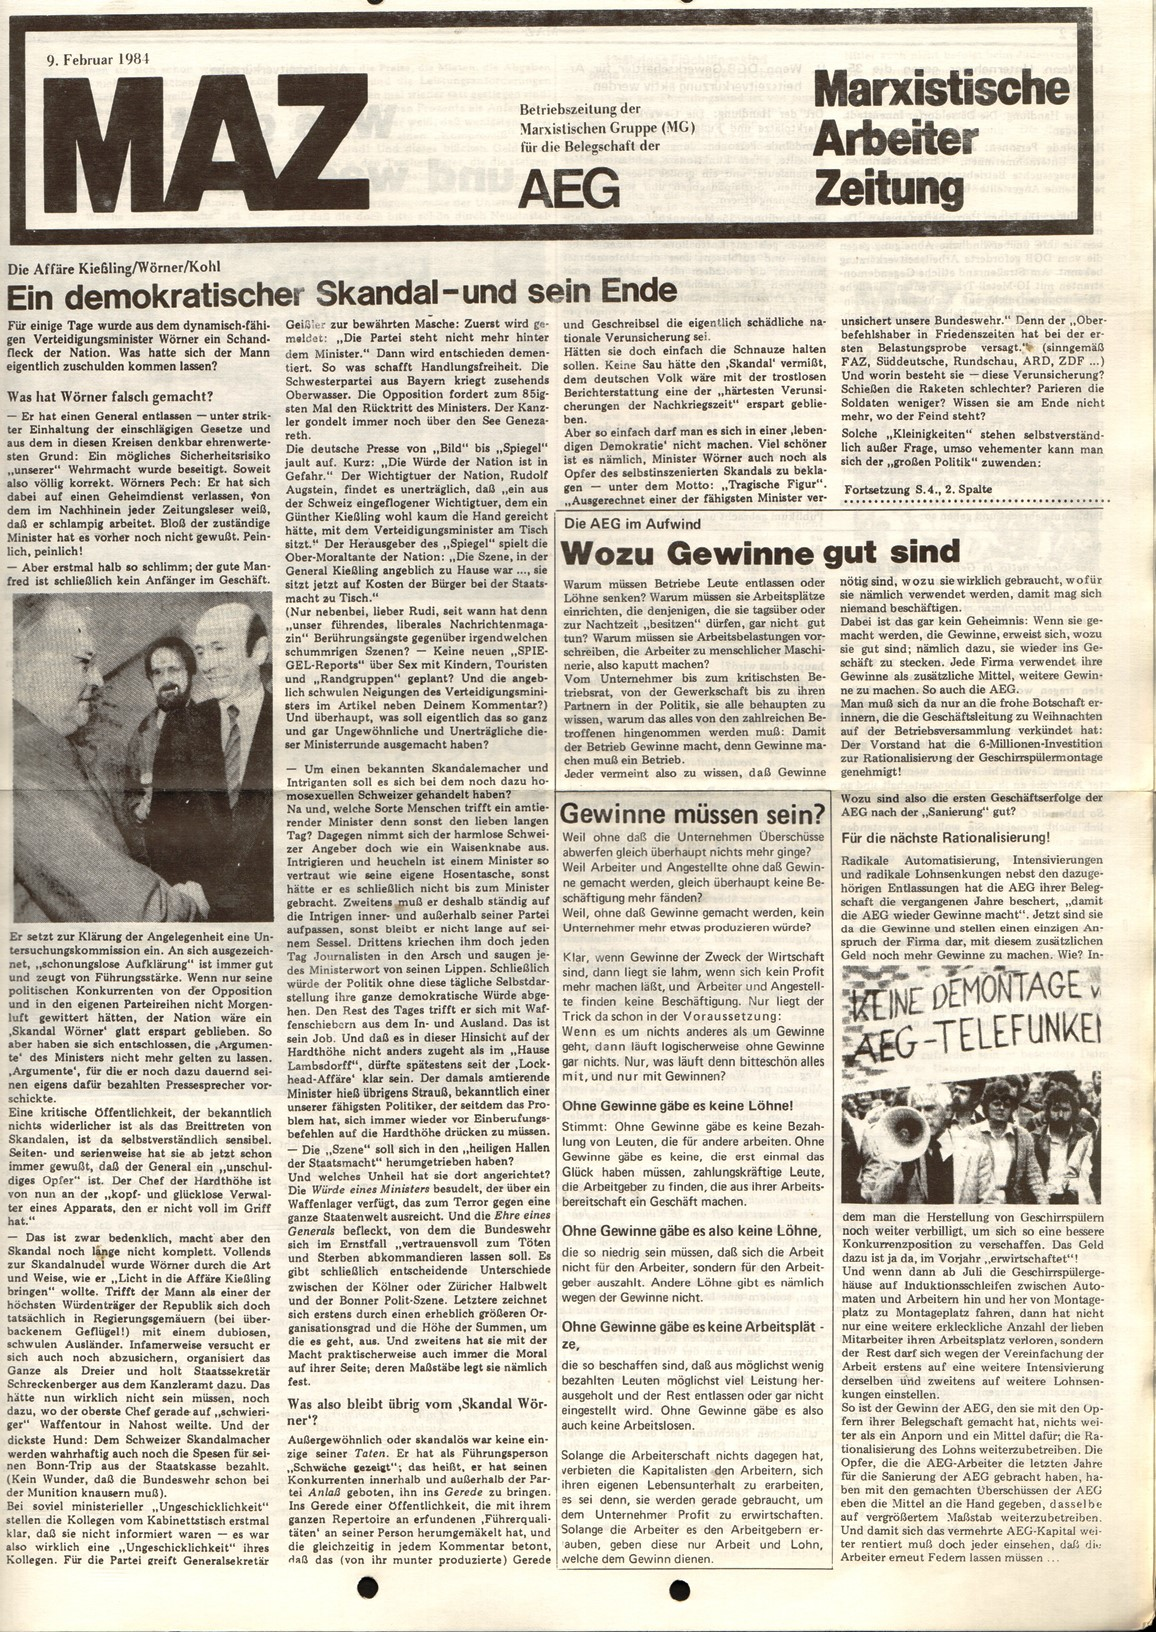 Nuernberg_MG_MAZ_AEG_19840209_01